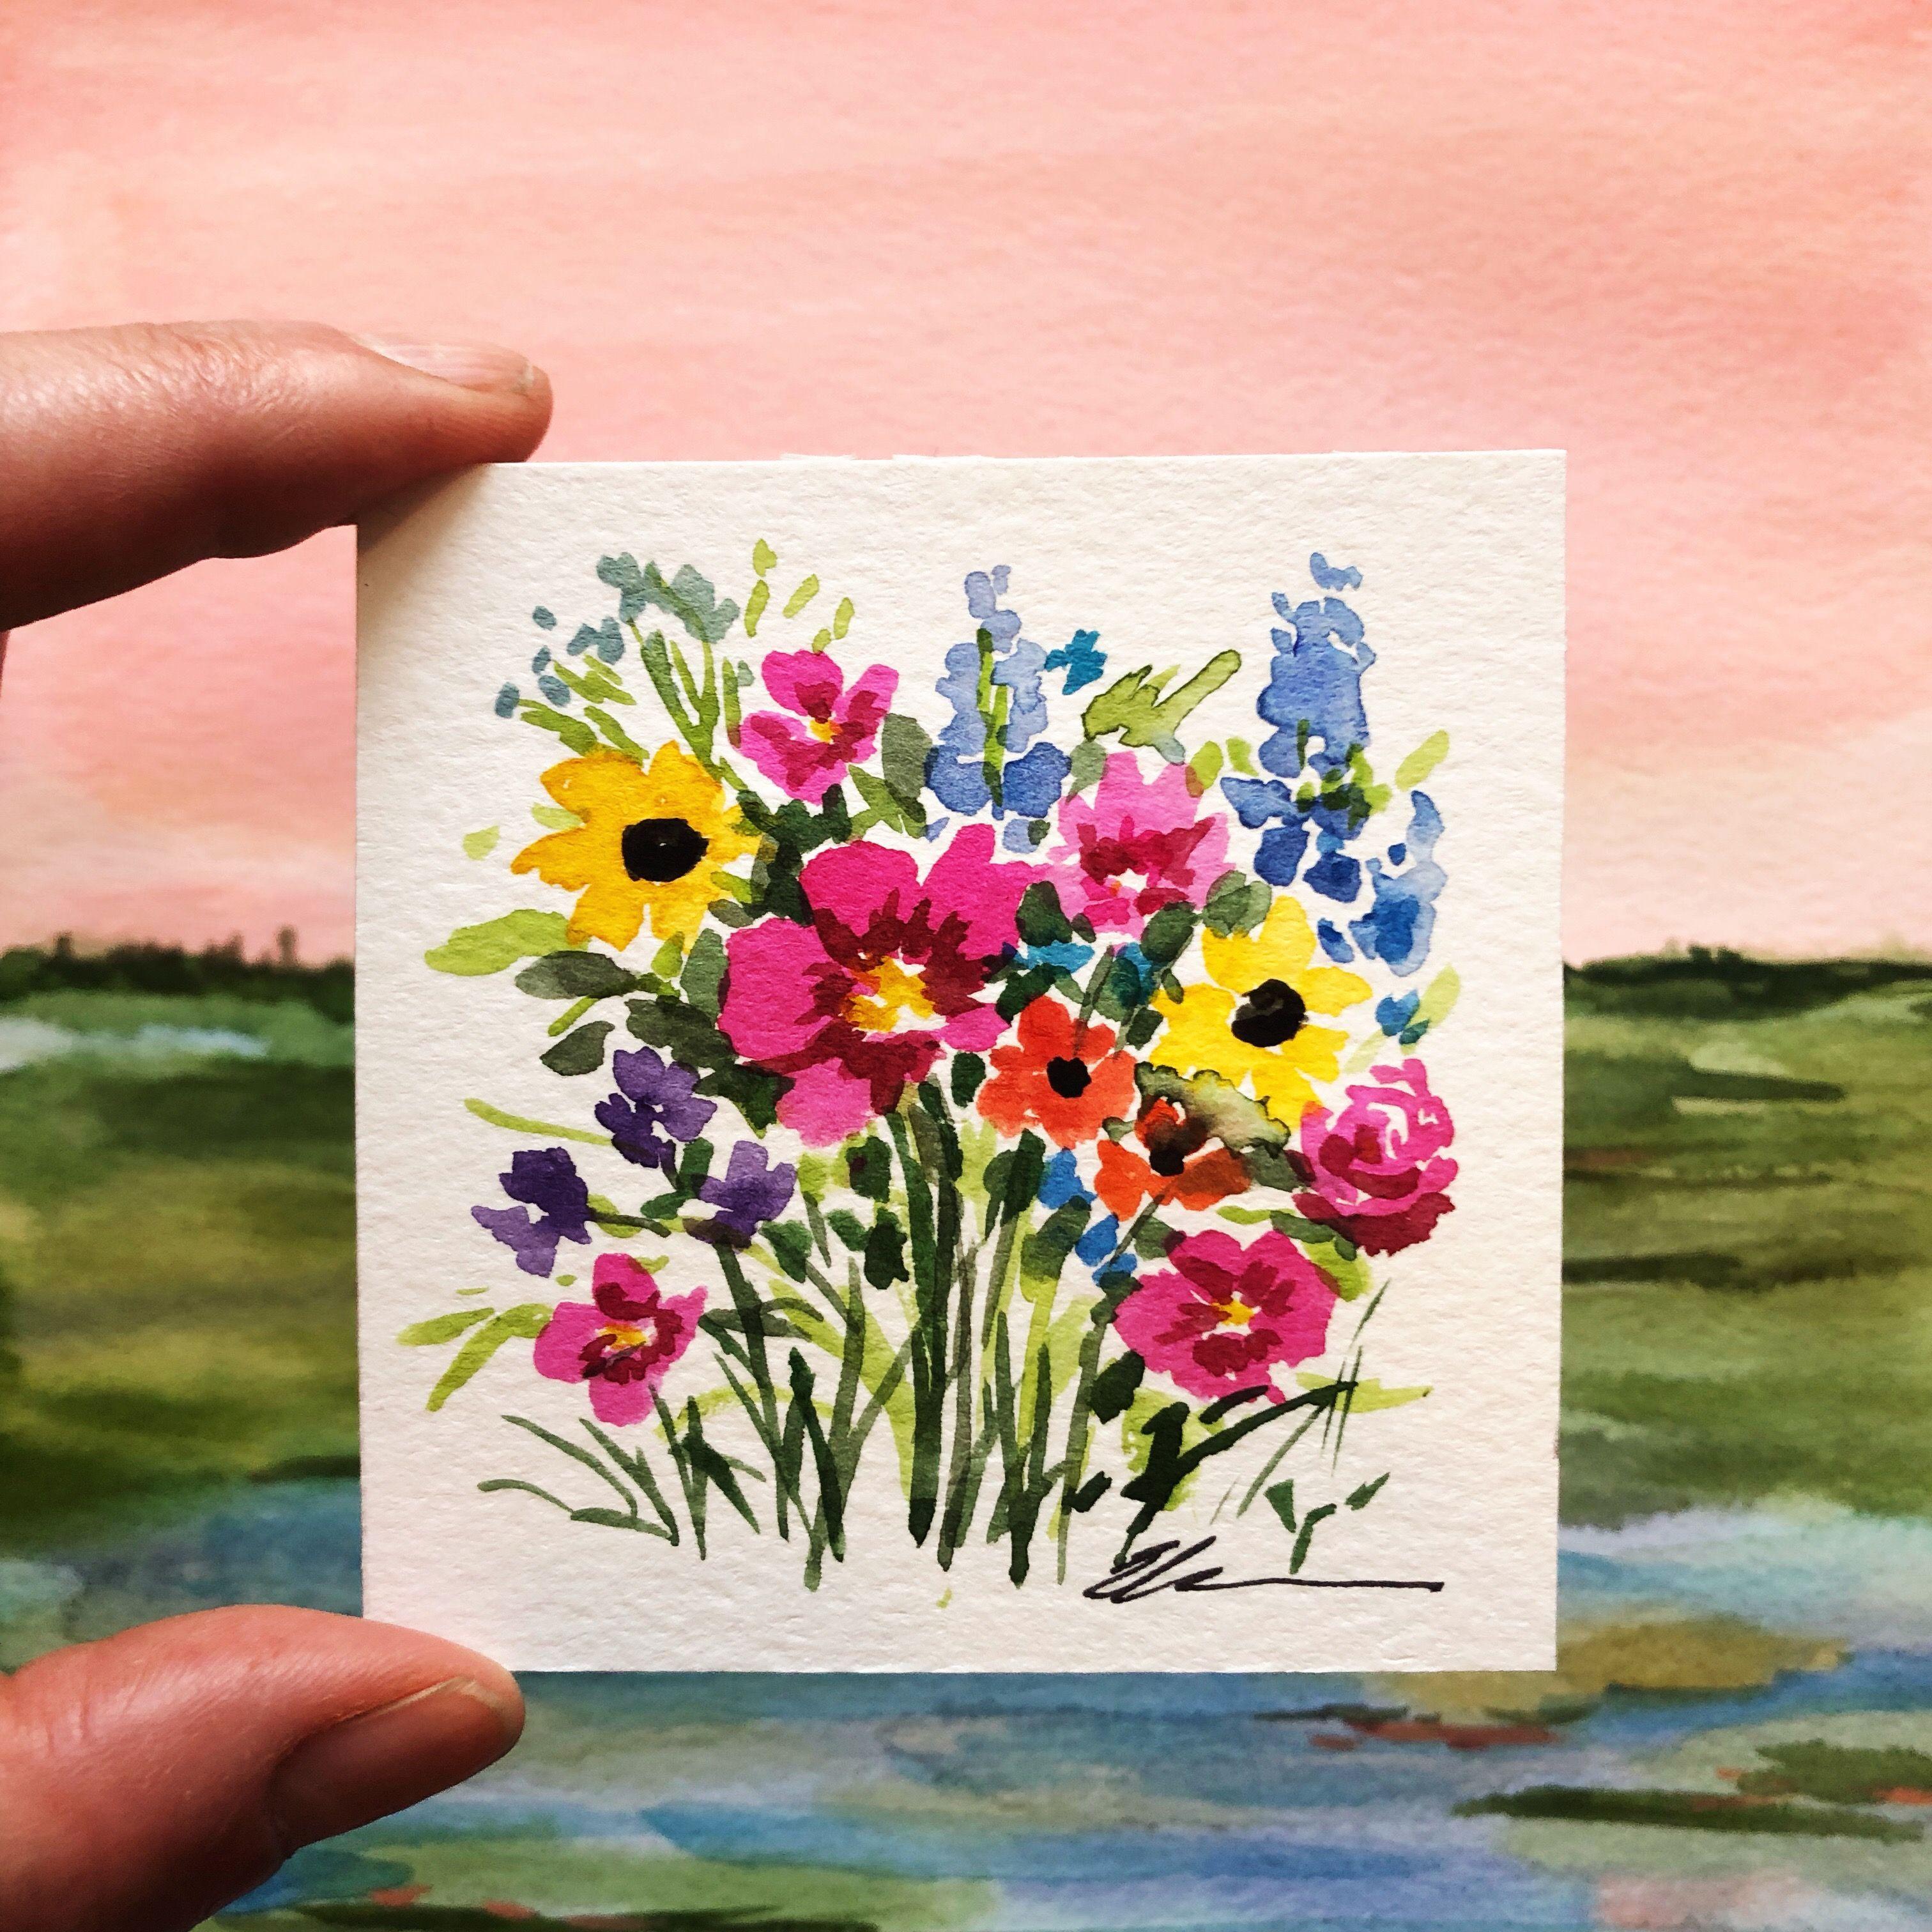 A Cute 3 X3 Mini Art Artwork Homedecor Watercolor Artist